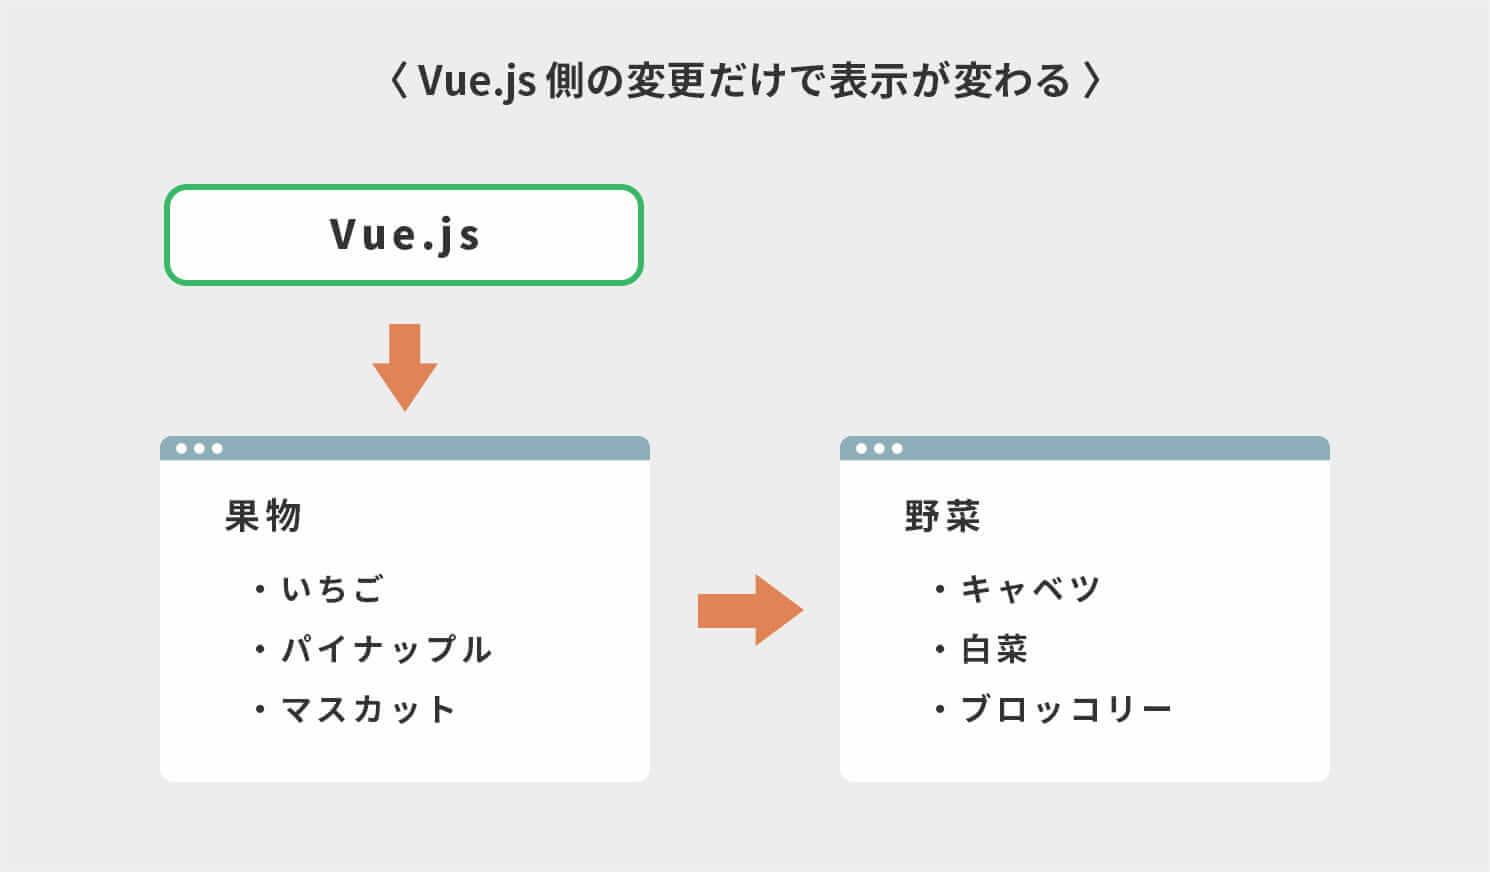 Vue.js側の変更だけで表示が変わる